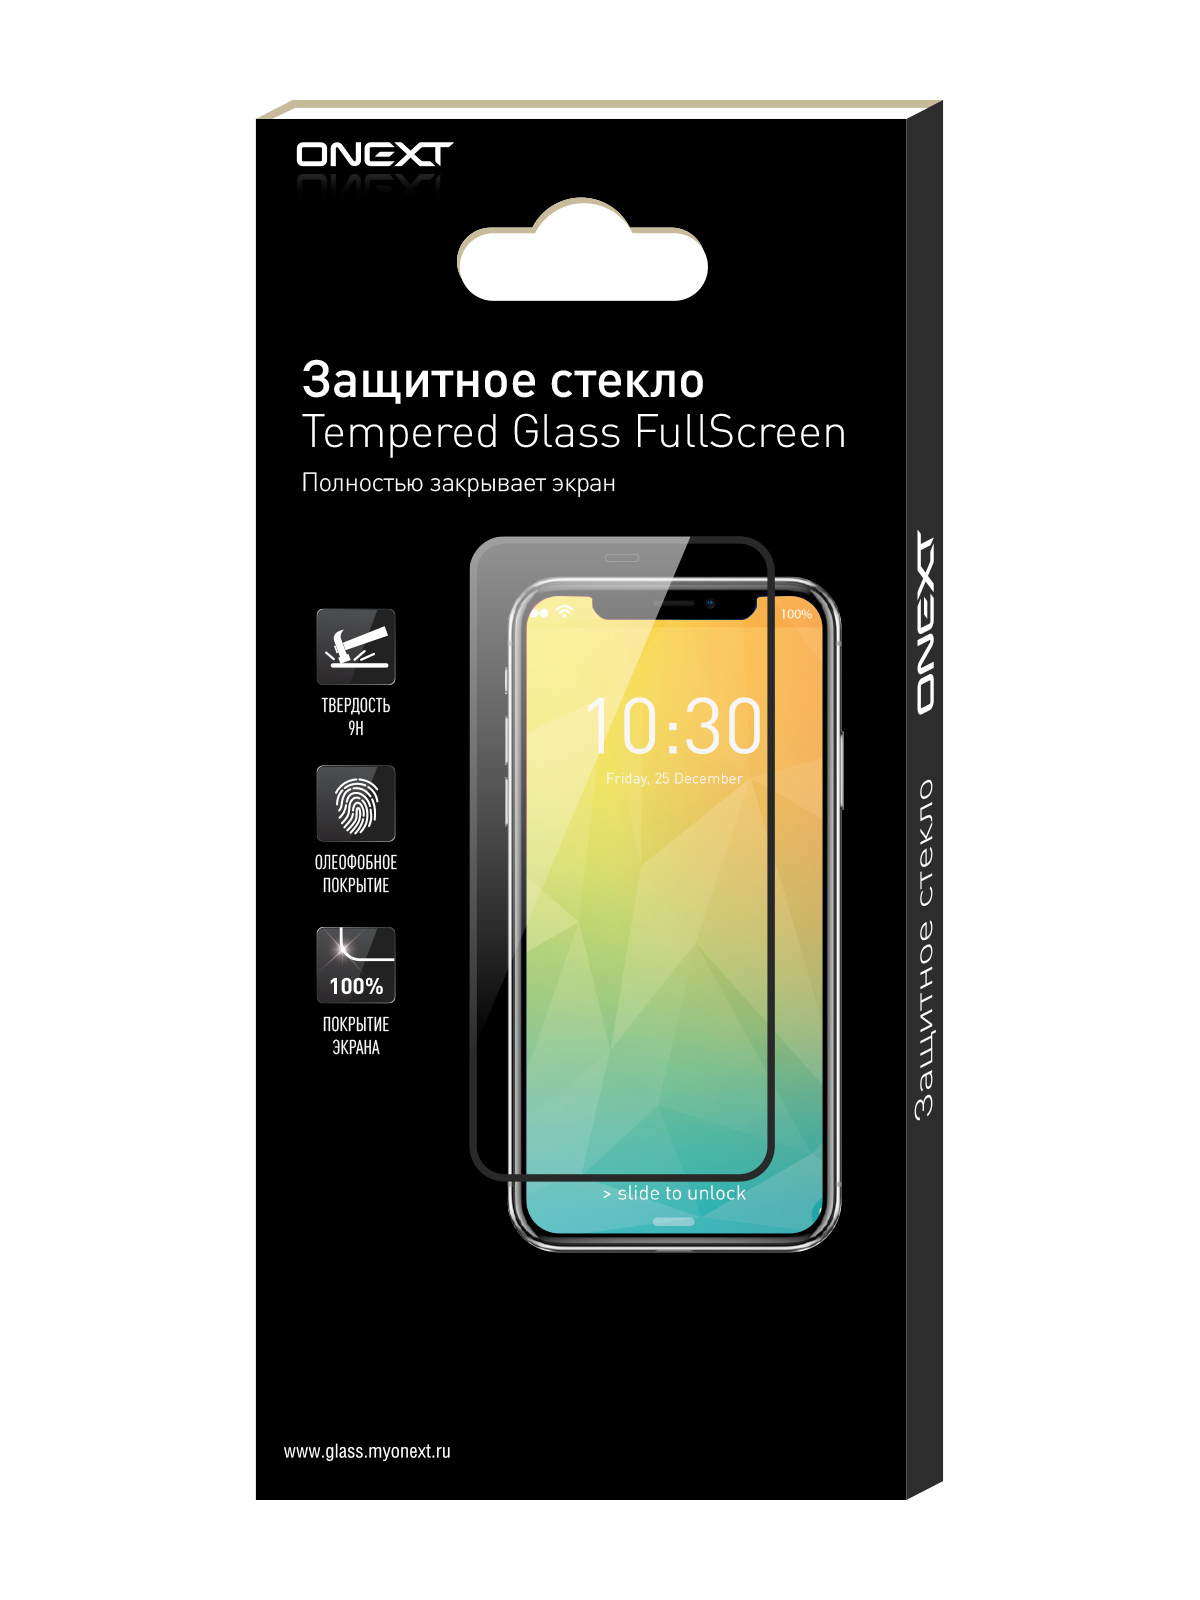 Защитное стекло ONEXT для Asus ZenFone Max Pro M2 (ZB631KL) Black